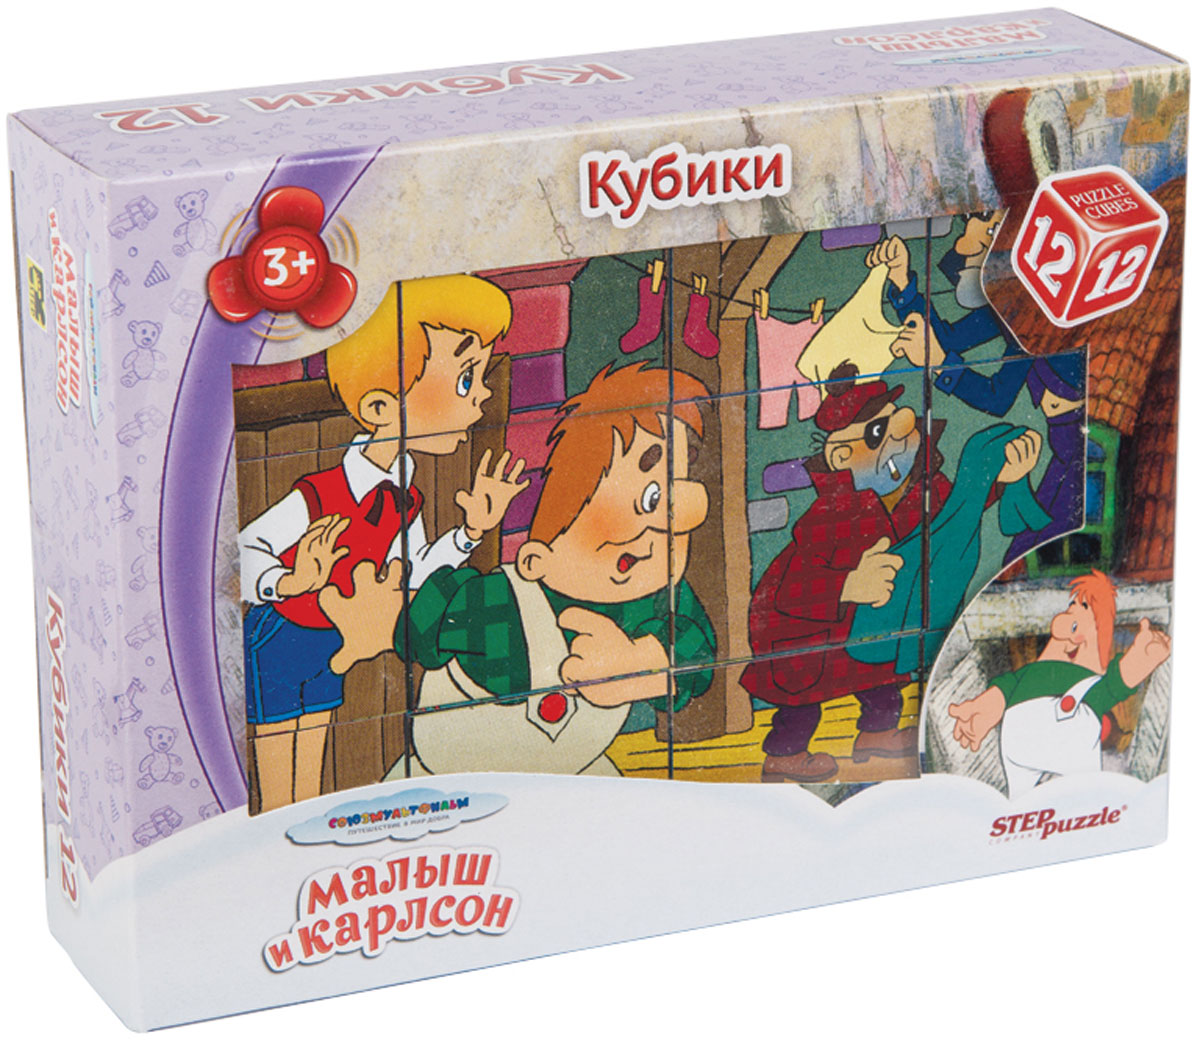 Step Puzzle Кубики Малыш и Карлсон кубики обучающие step by step кто где живет